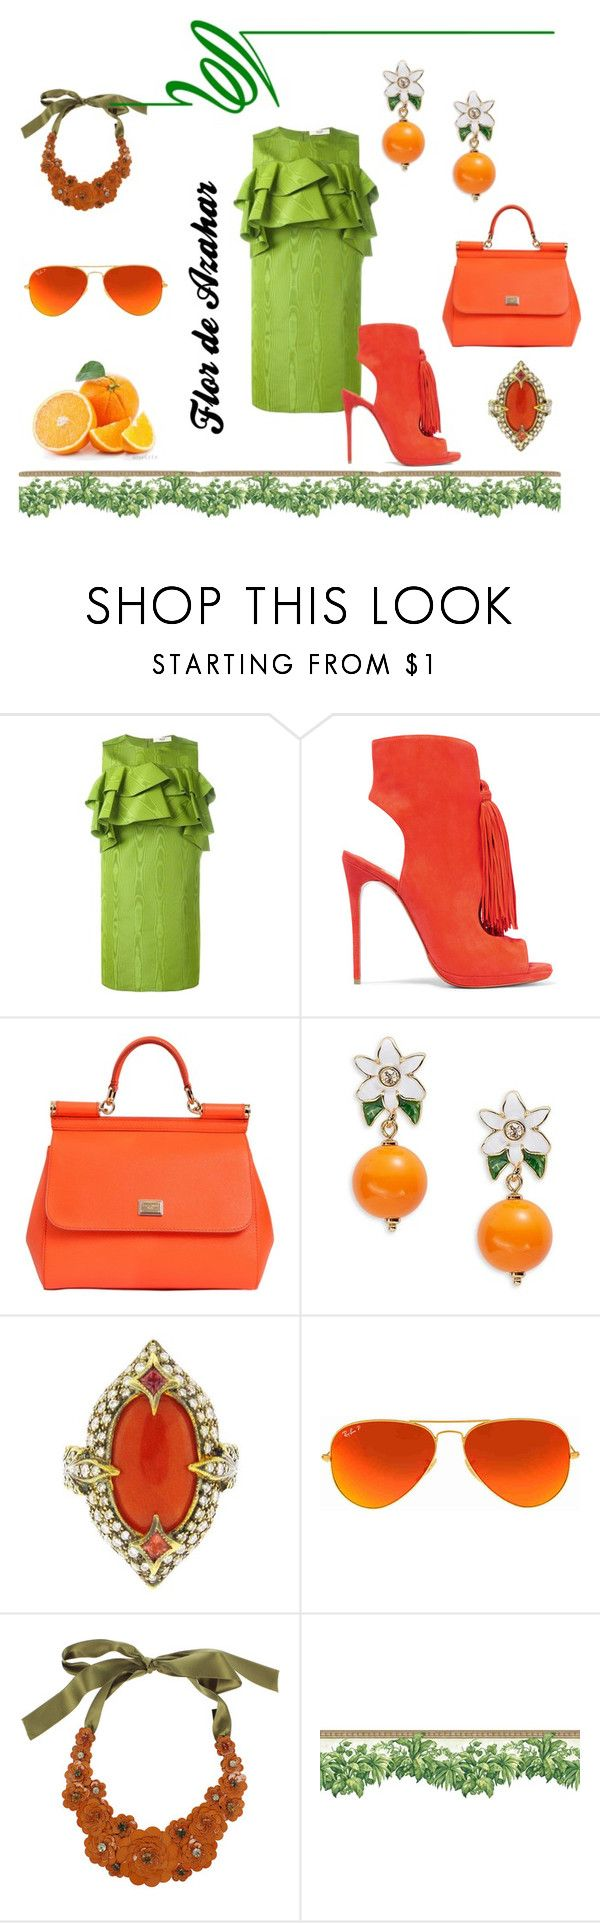 """Flor de Azahar"" by flowerbud77 on Polyvore featuring moda, Bally, Christian Louboutin, Dolce&Gabbana, Kate Spade, Cathy Waterman, Ray-Ban y Liberty"